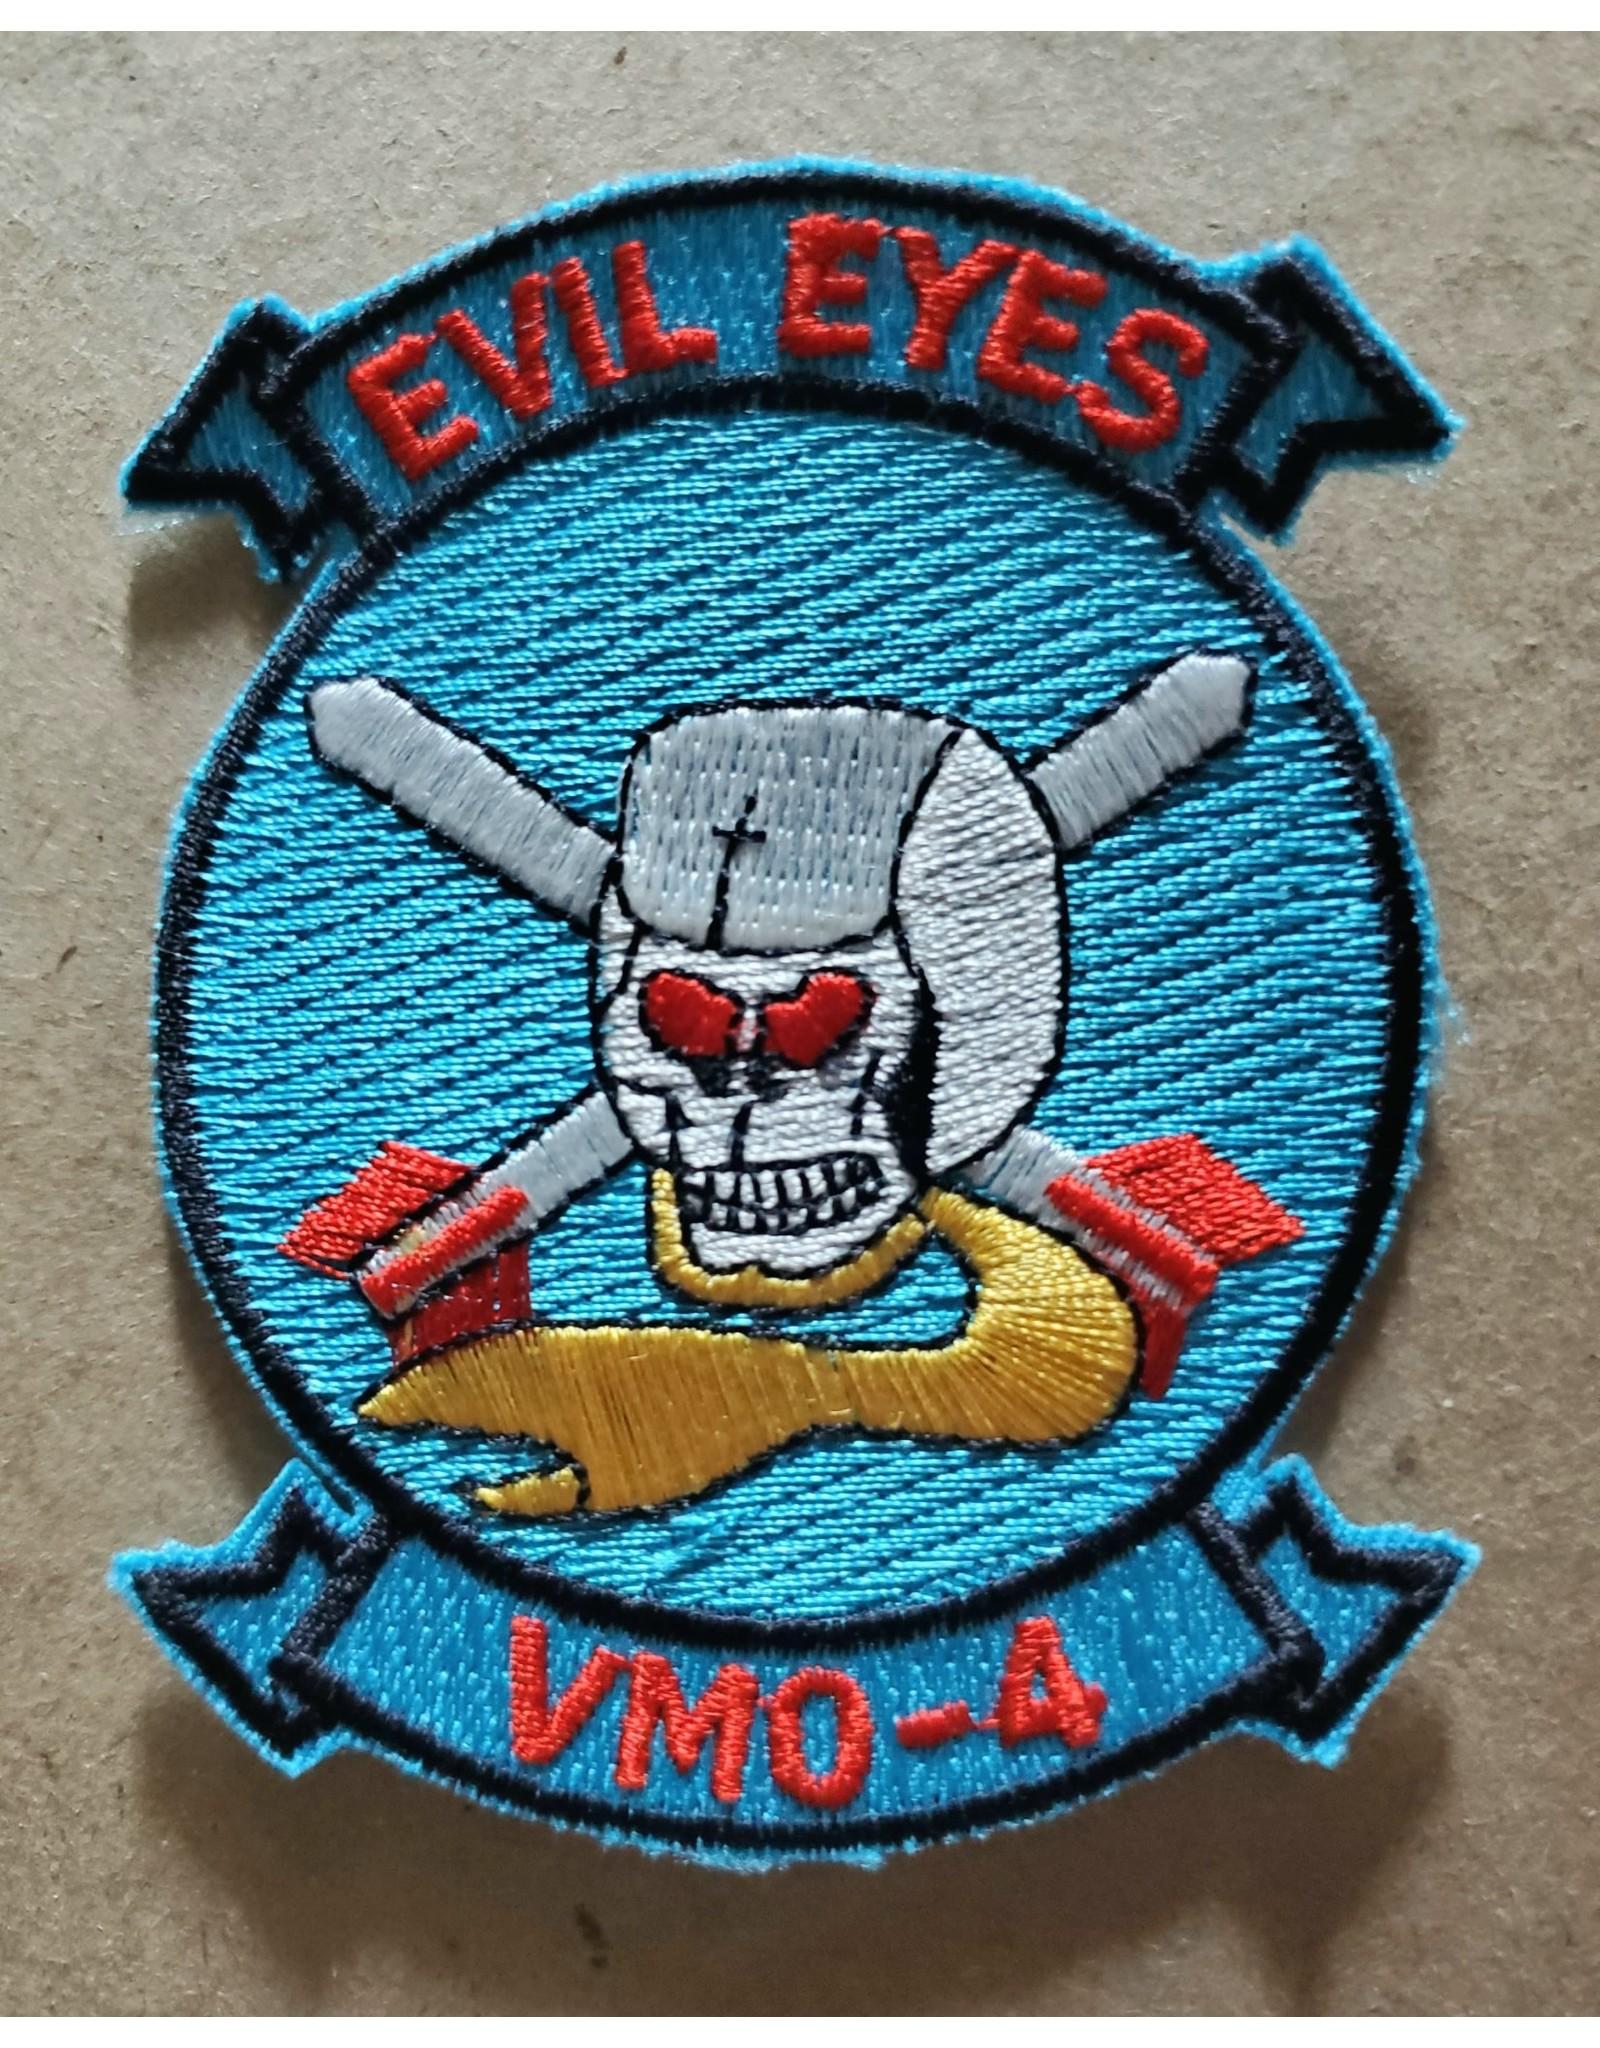 FWAM VMO-4 Evil Eyes (7), patch